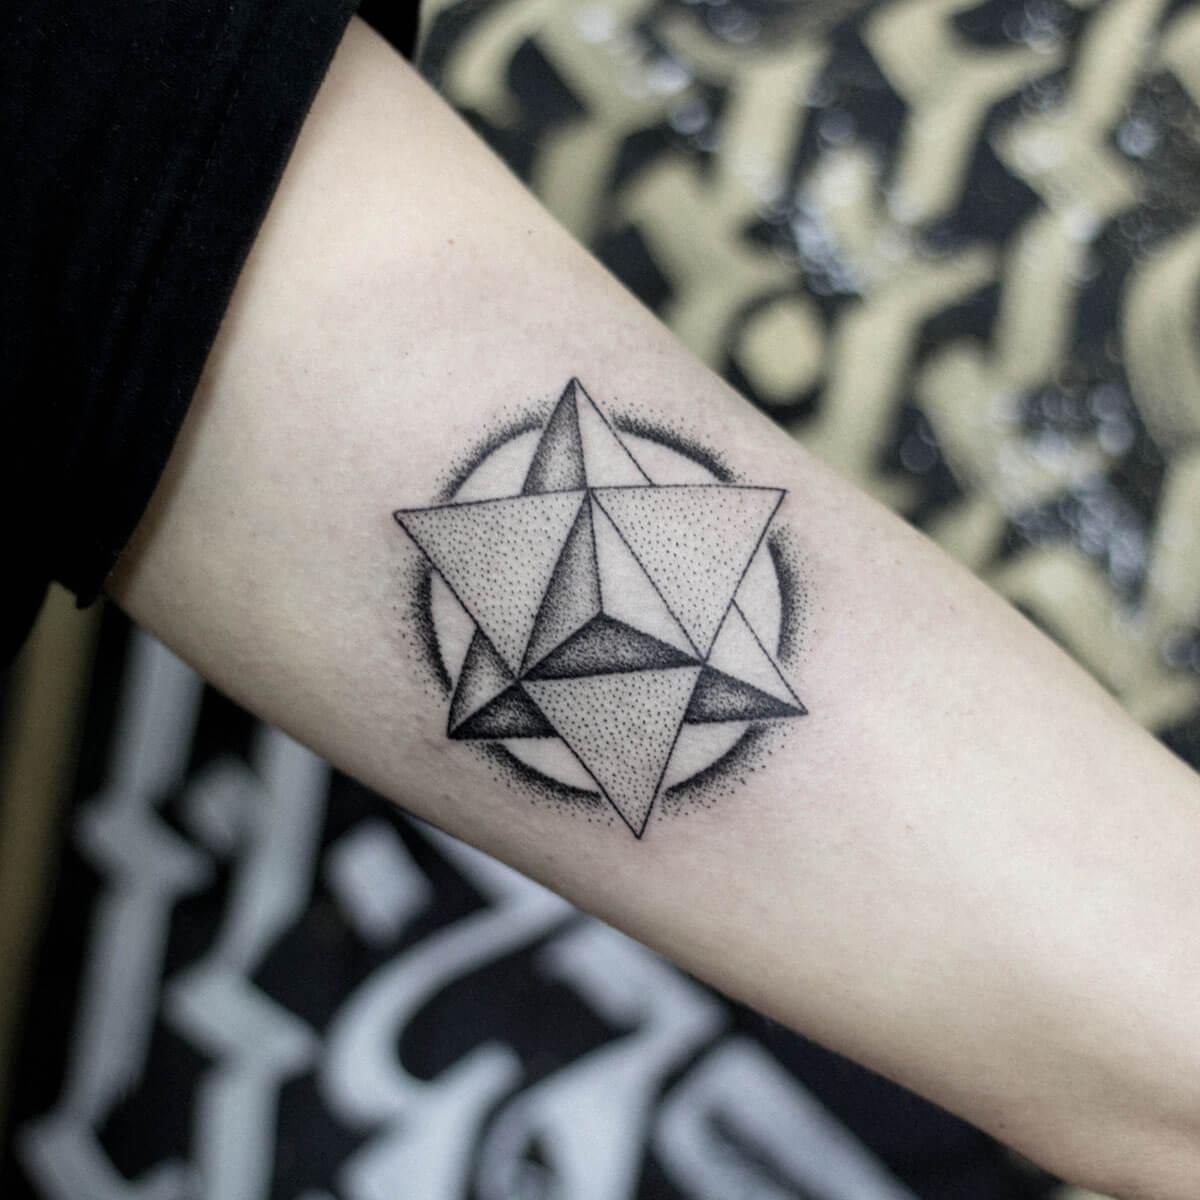 Dotwork style triangle tattoo